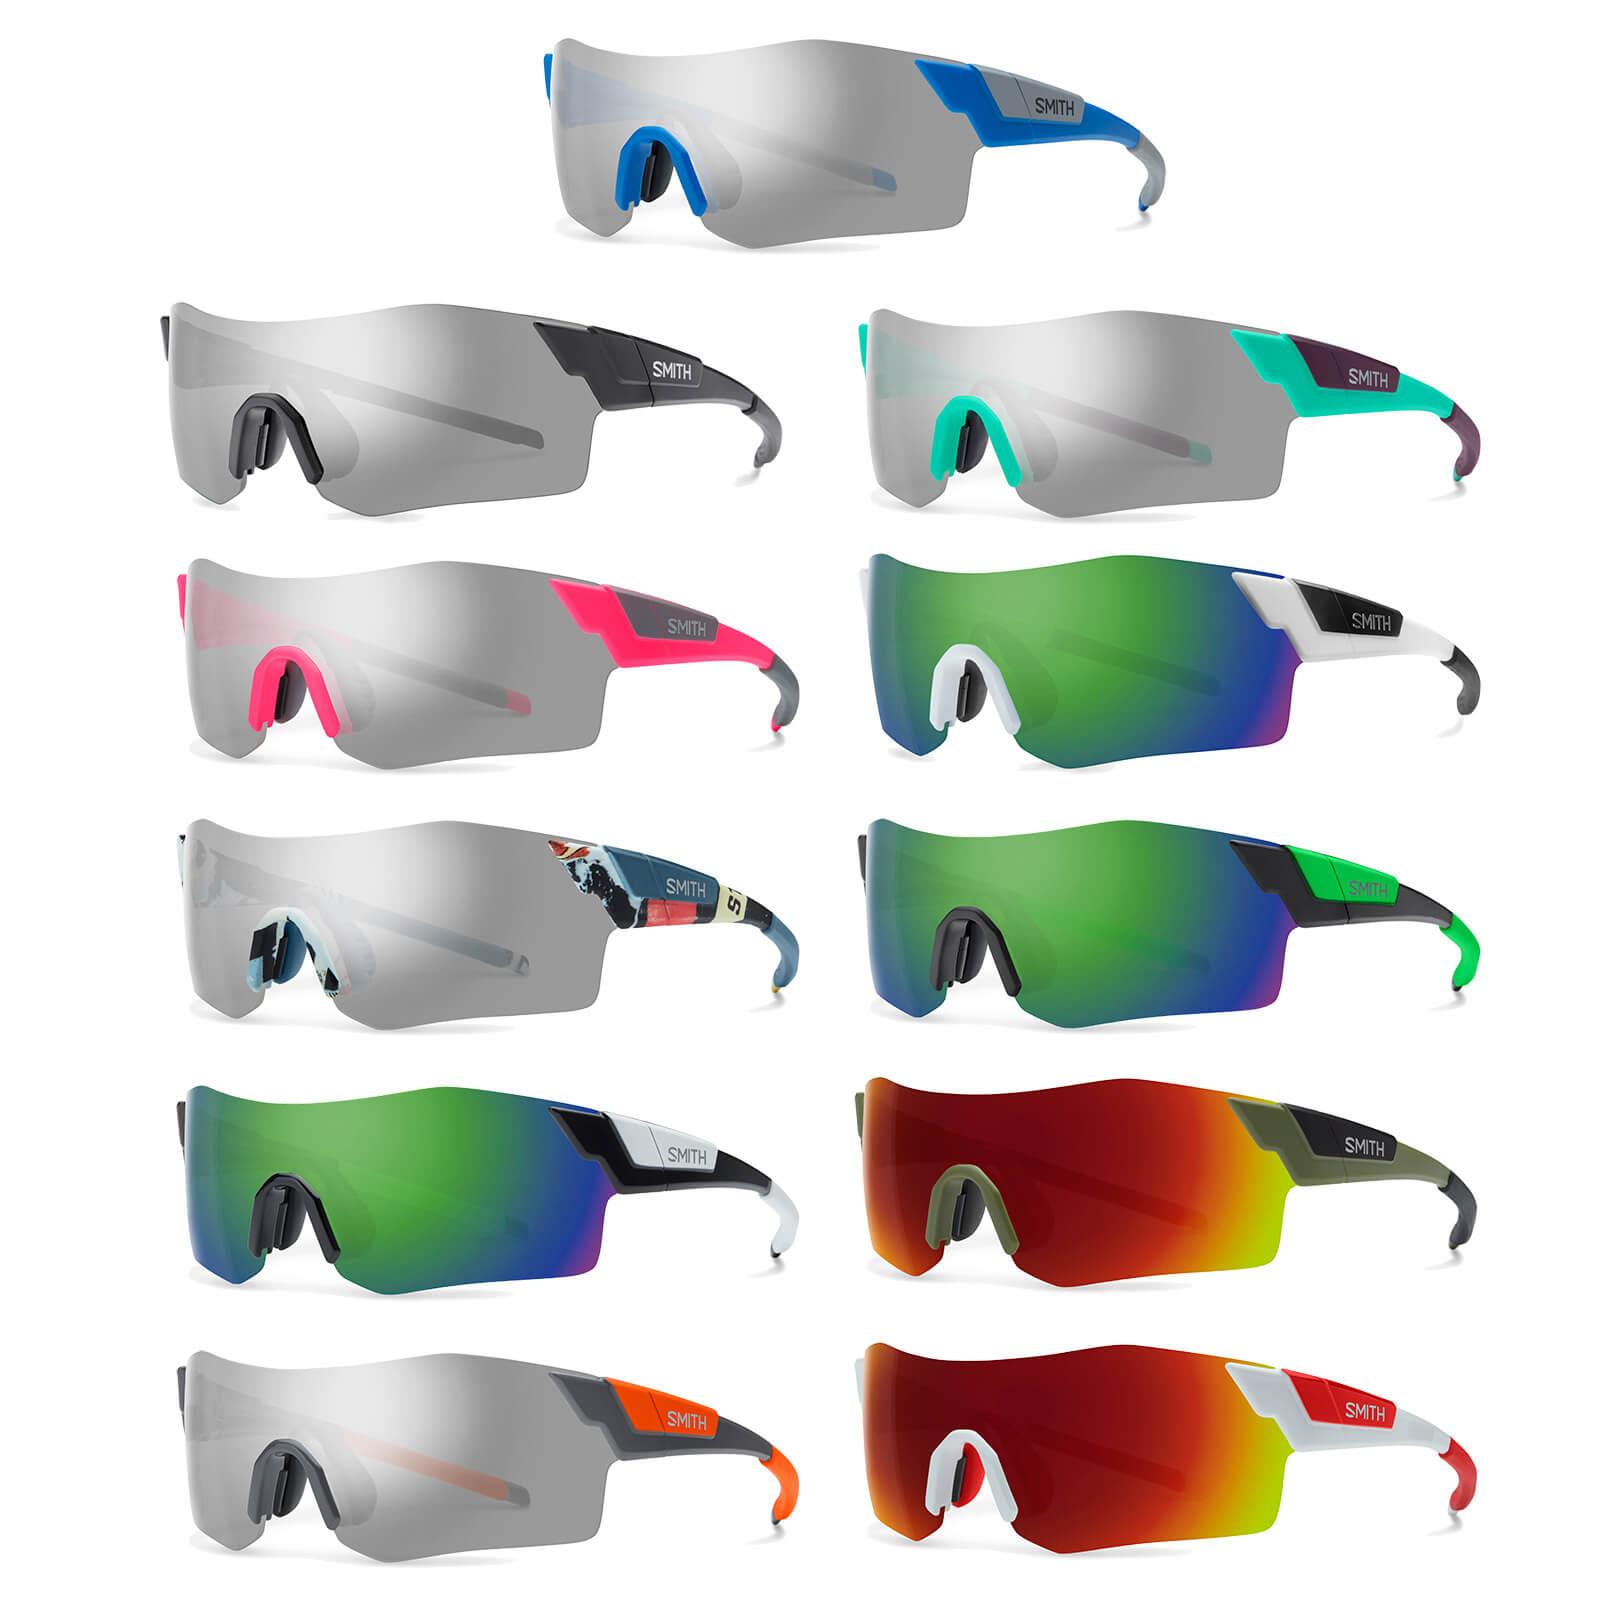 645574a41d1 Smith Pivlock Arena ChromaPop Sunglasses